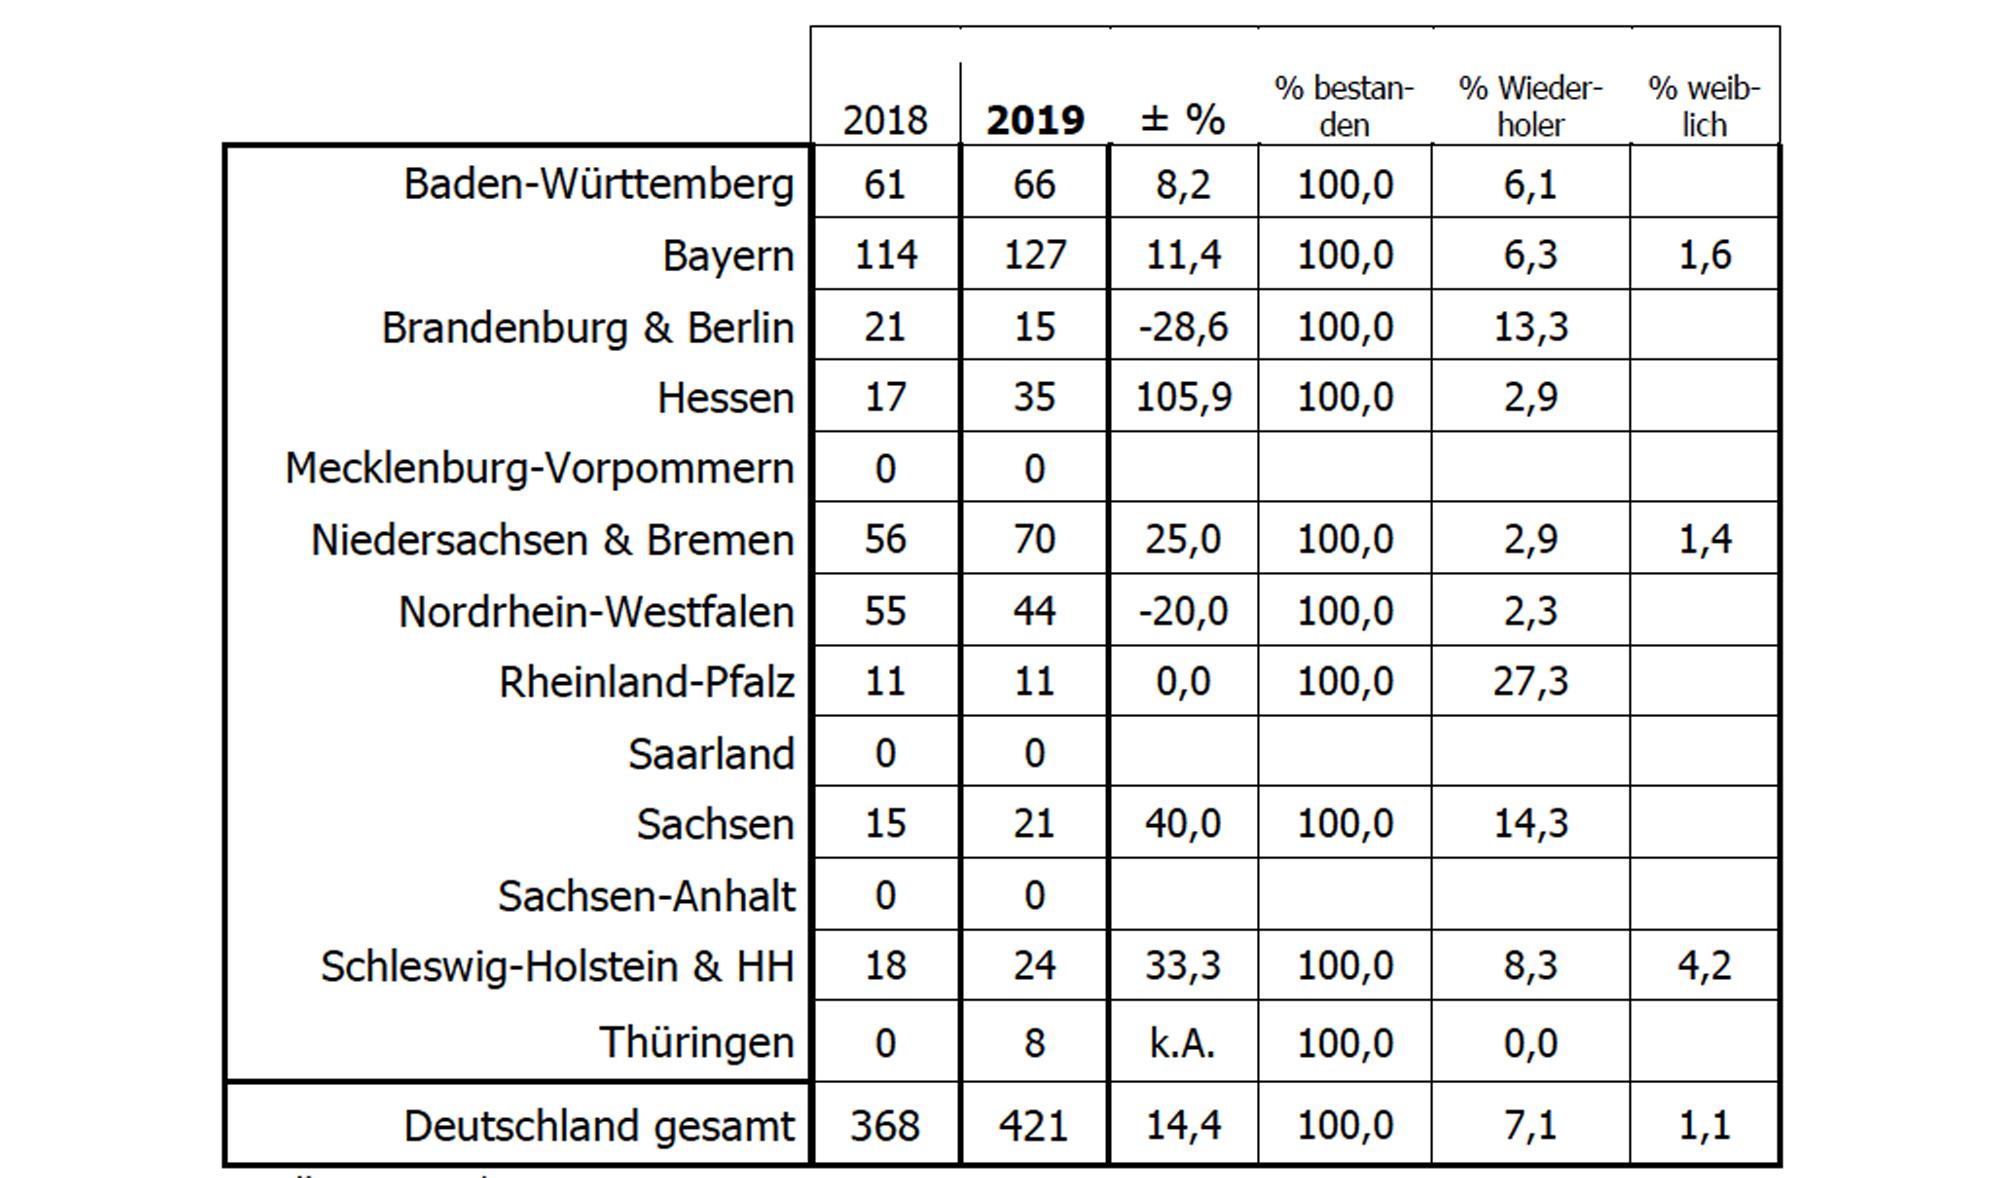 421 neue Landmaschinenmechaniker|copyright: Bundesverband LandBauTechnik